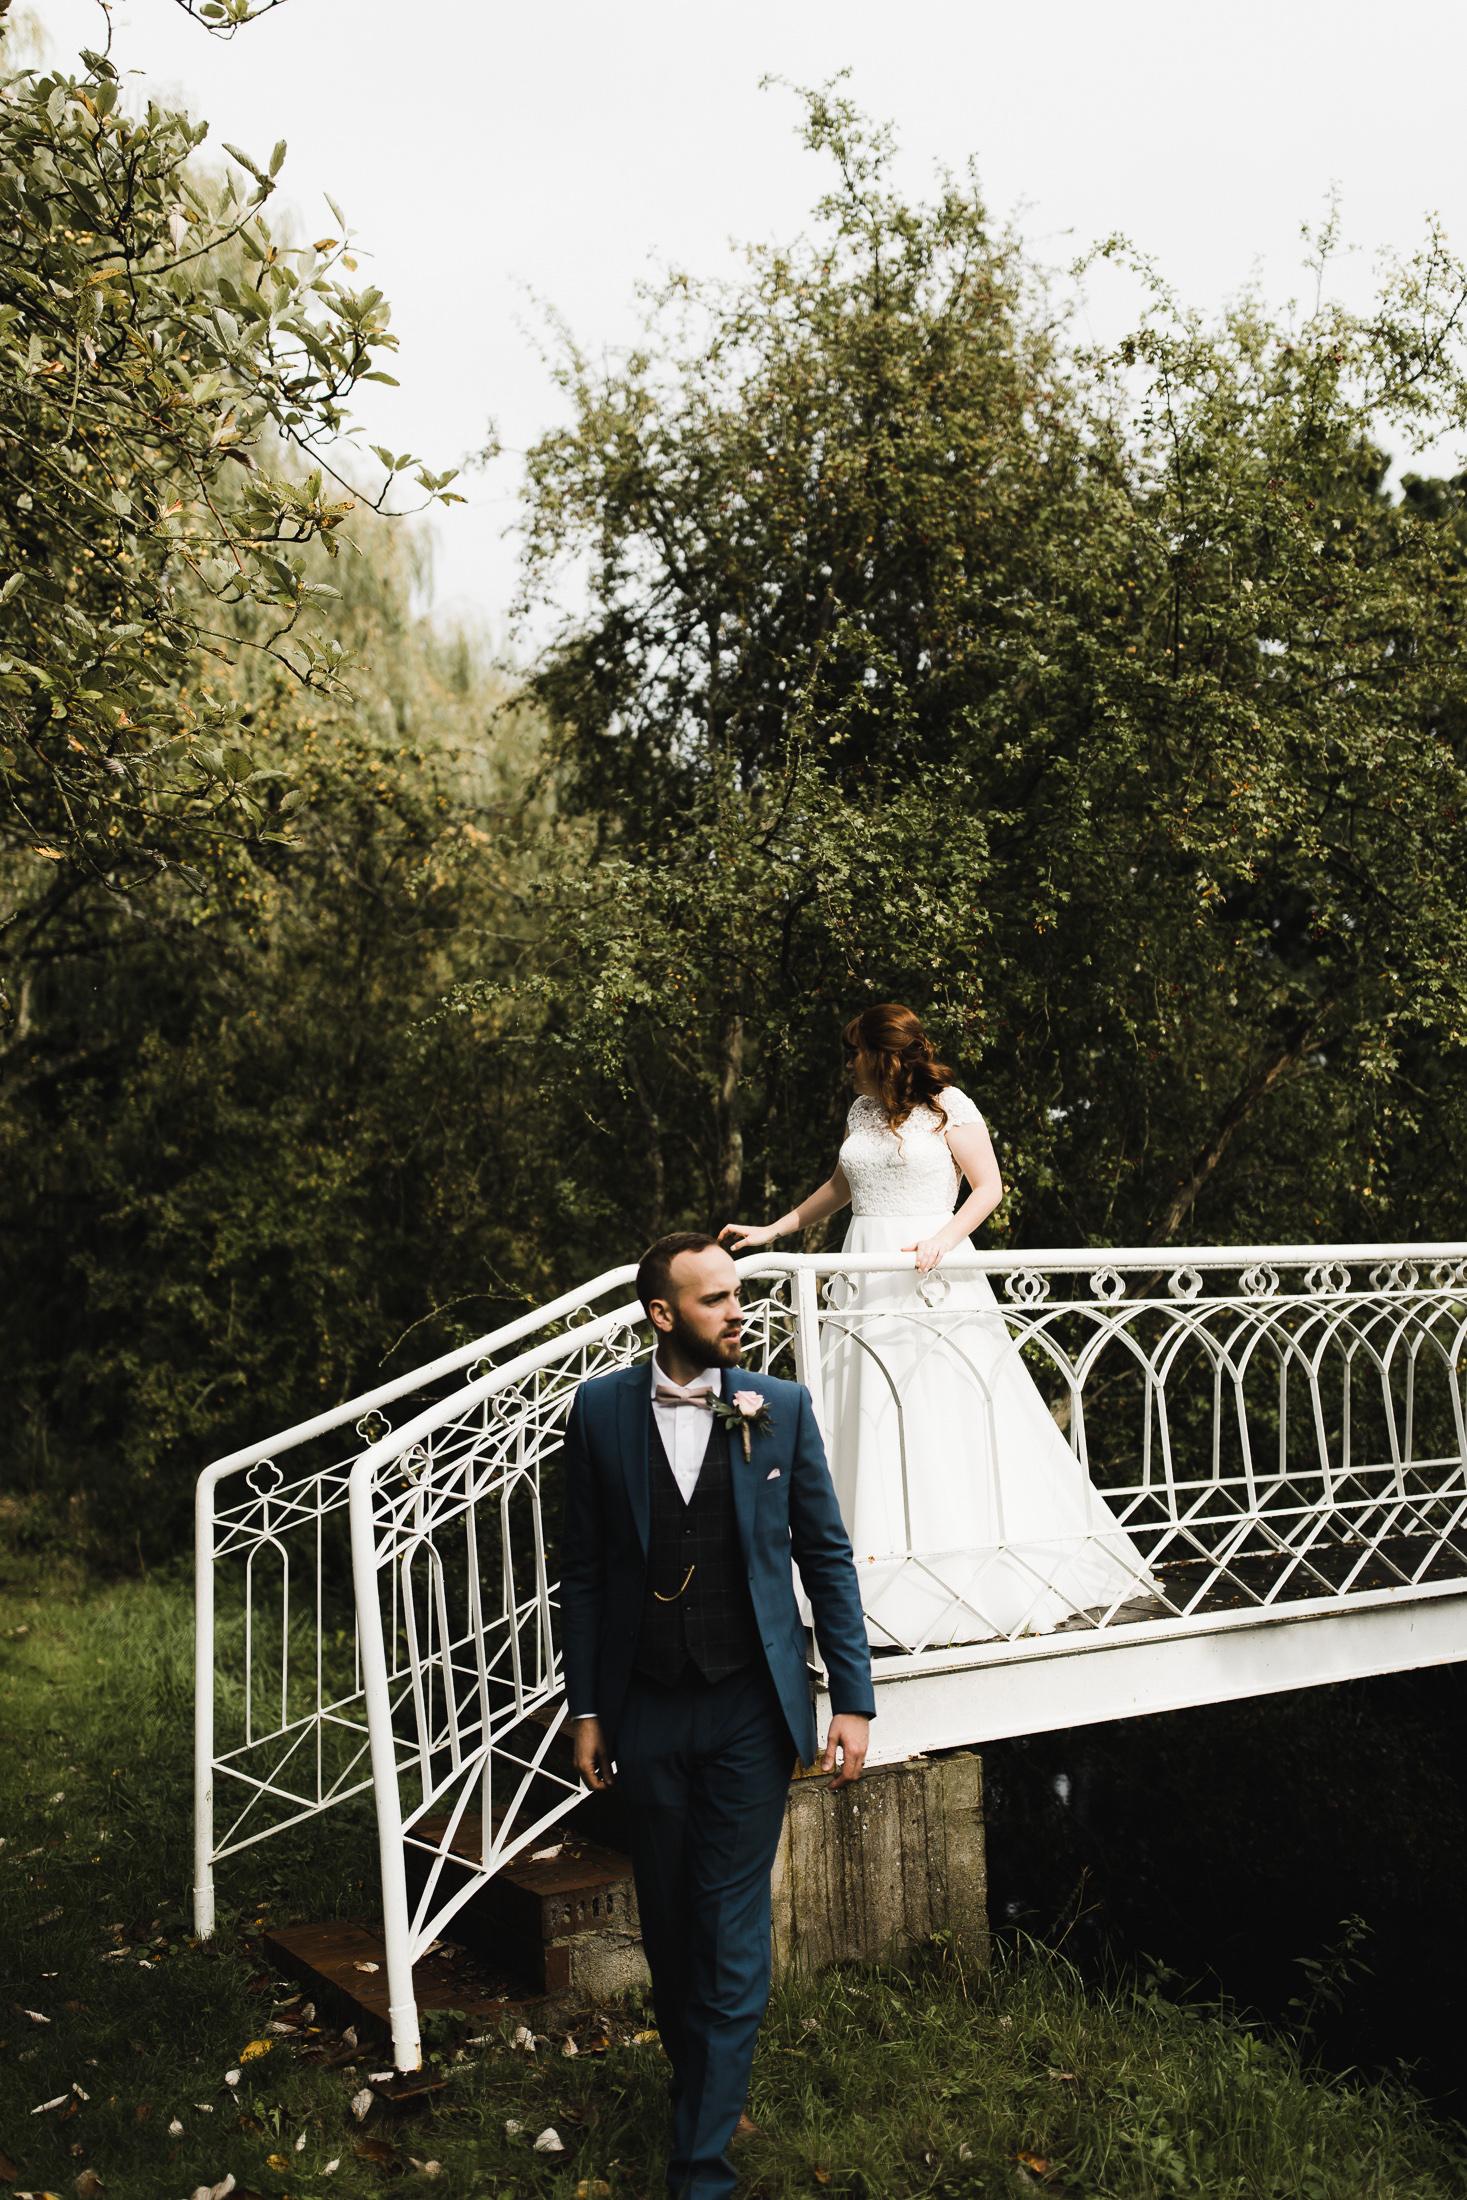 Nether_Wichendon_House_Wedding_062.jpg